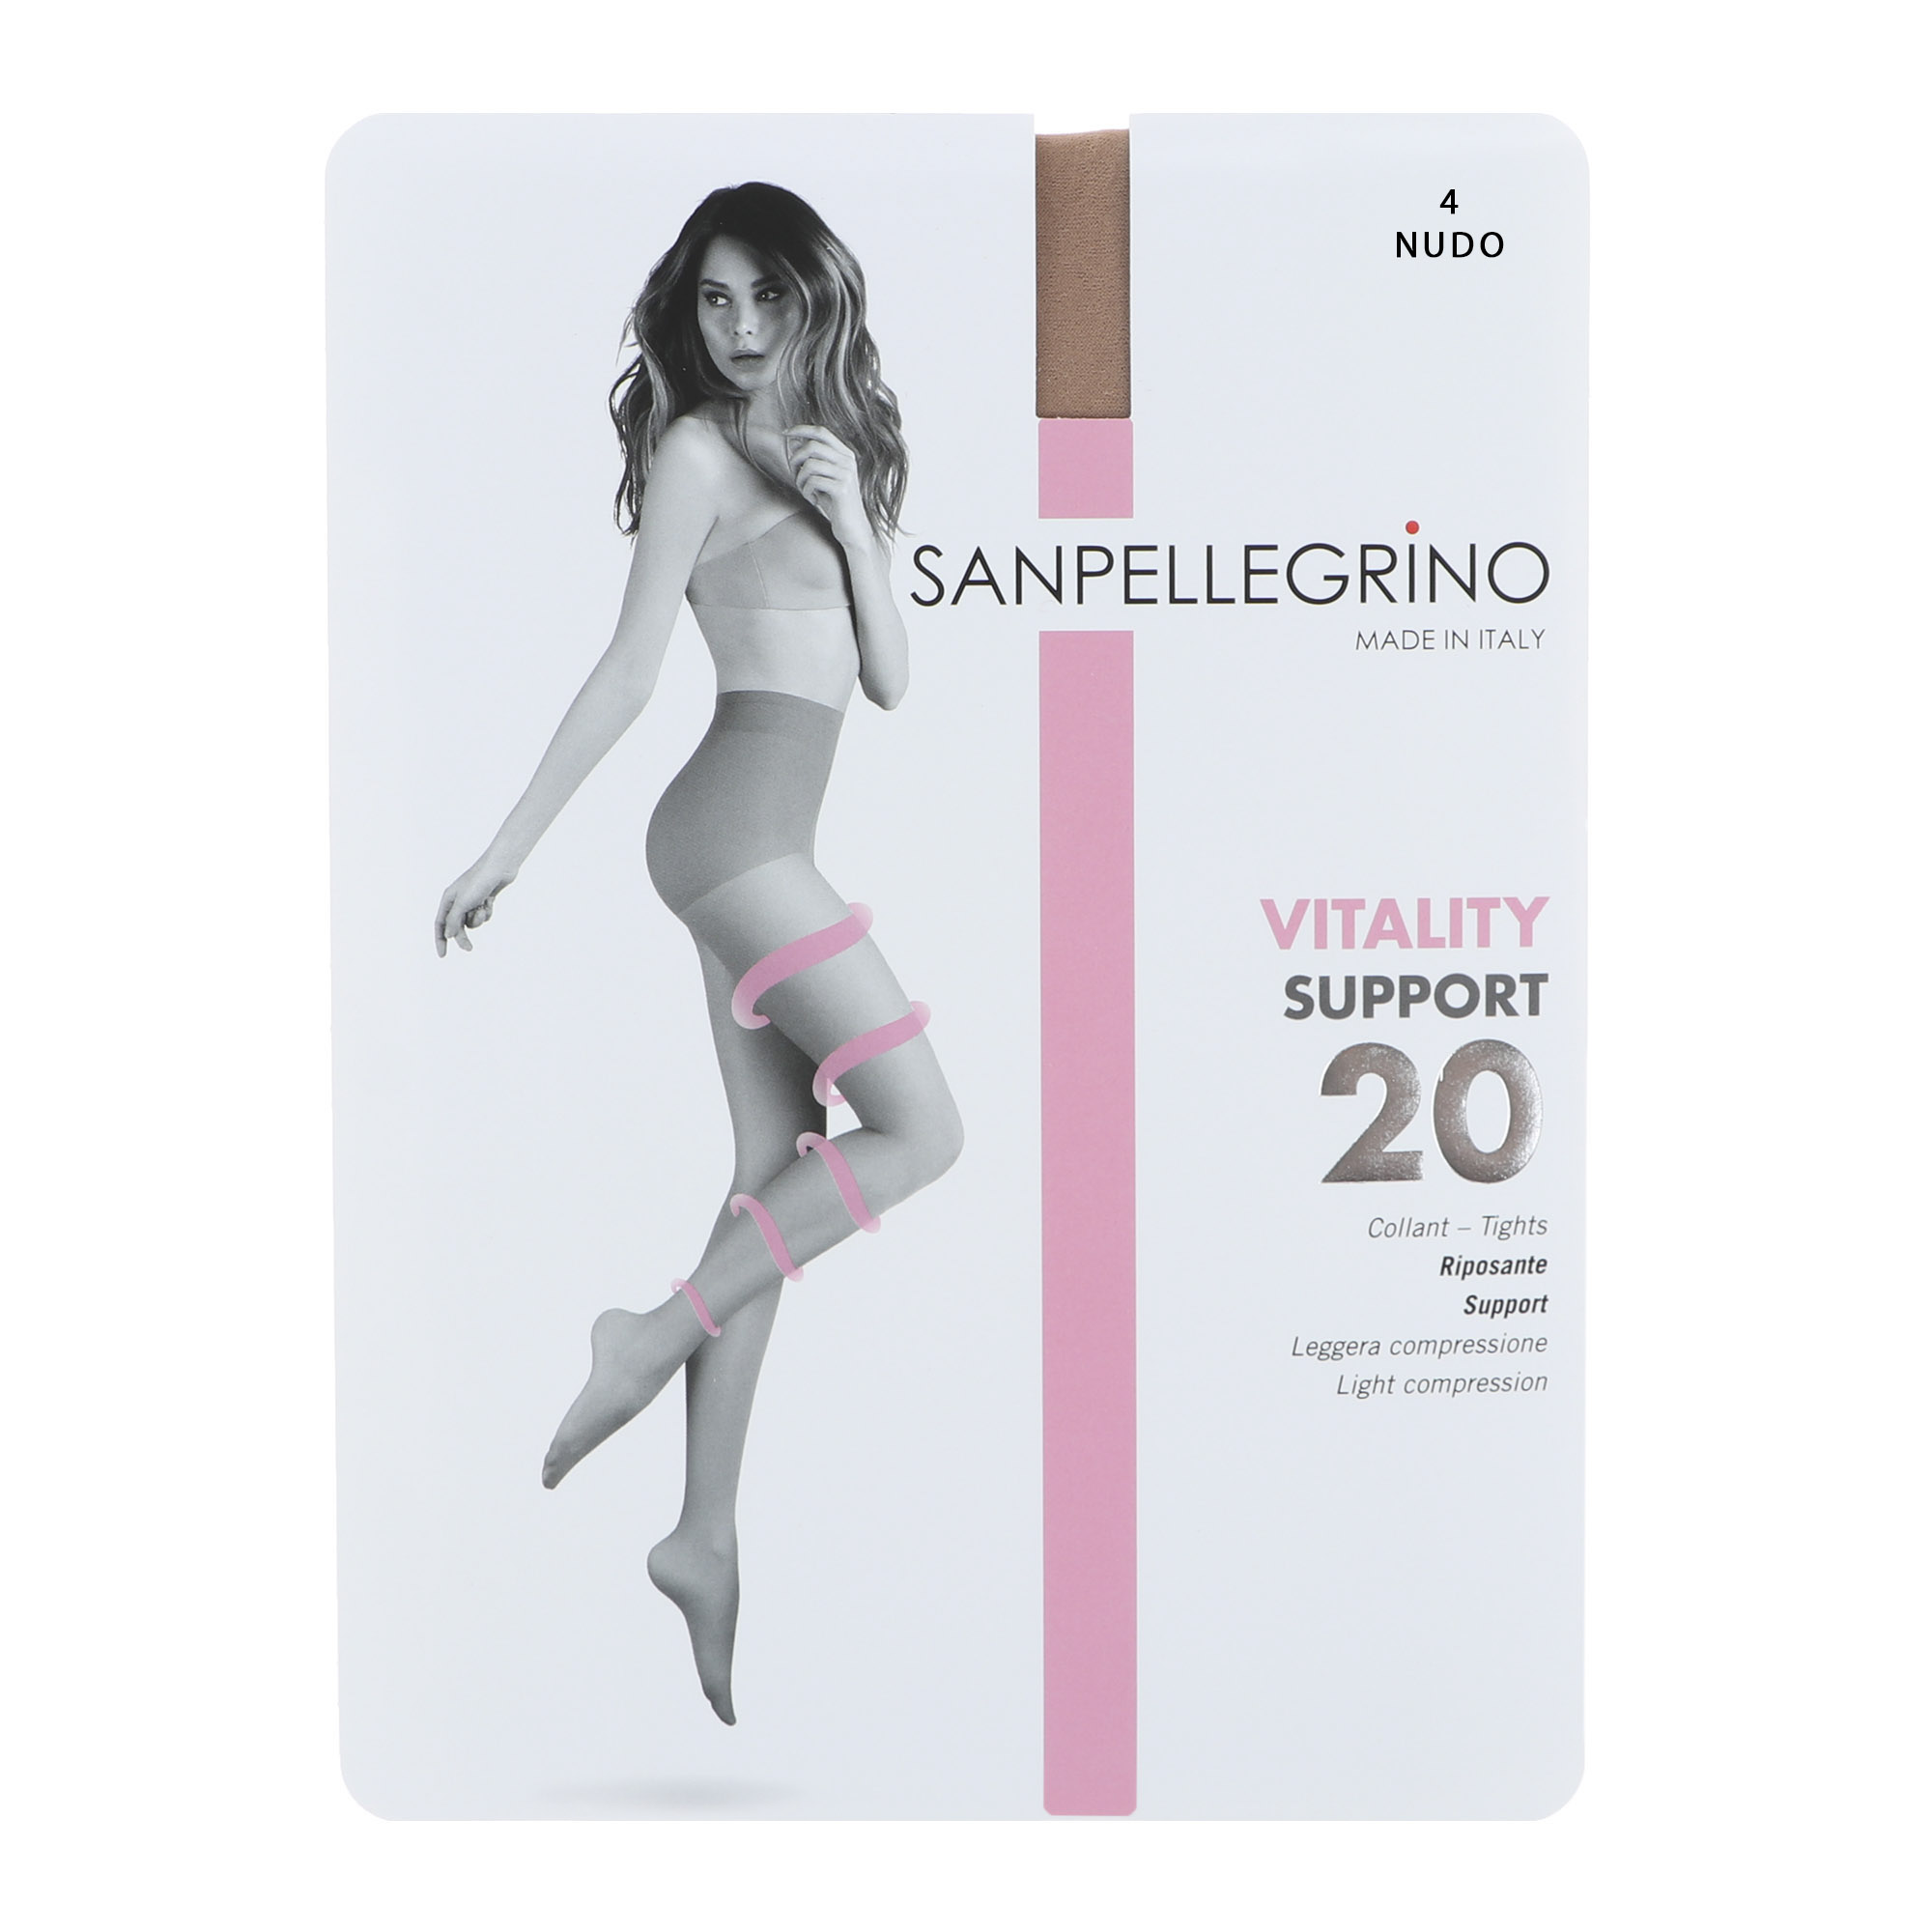 Колготки Sanpellegrino Support 20 Comfort Nudo XL колготки sanpellegrino comodo curvy 20 nudo xl